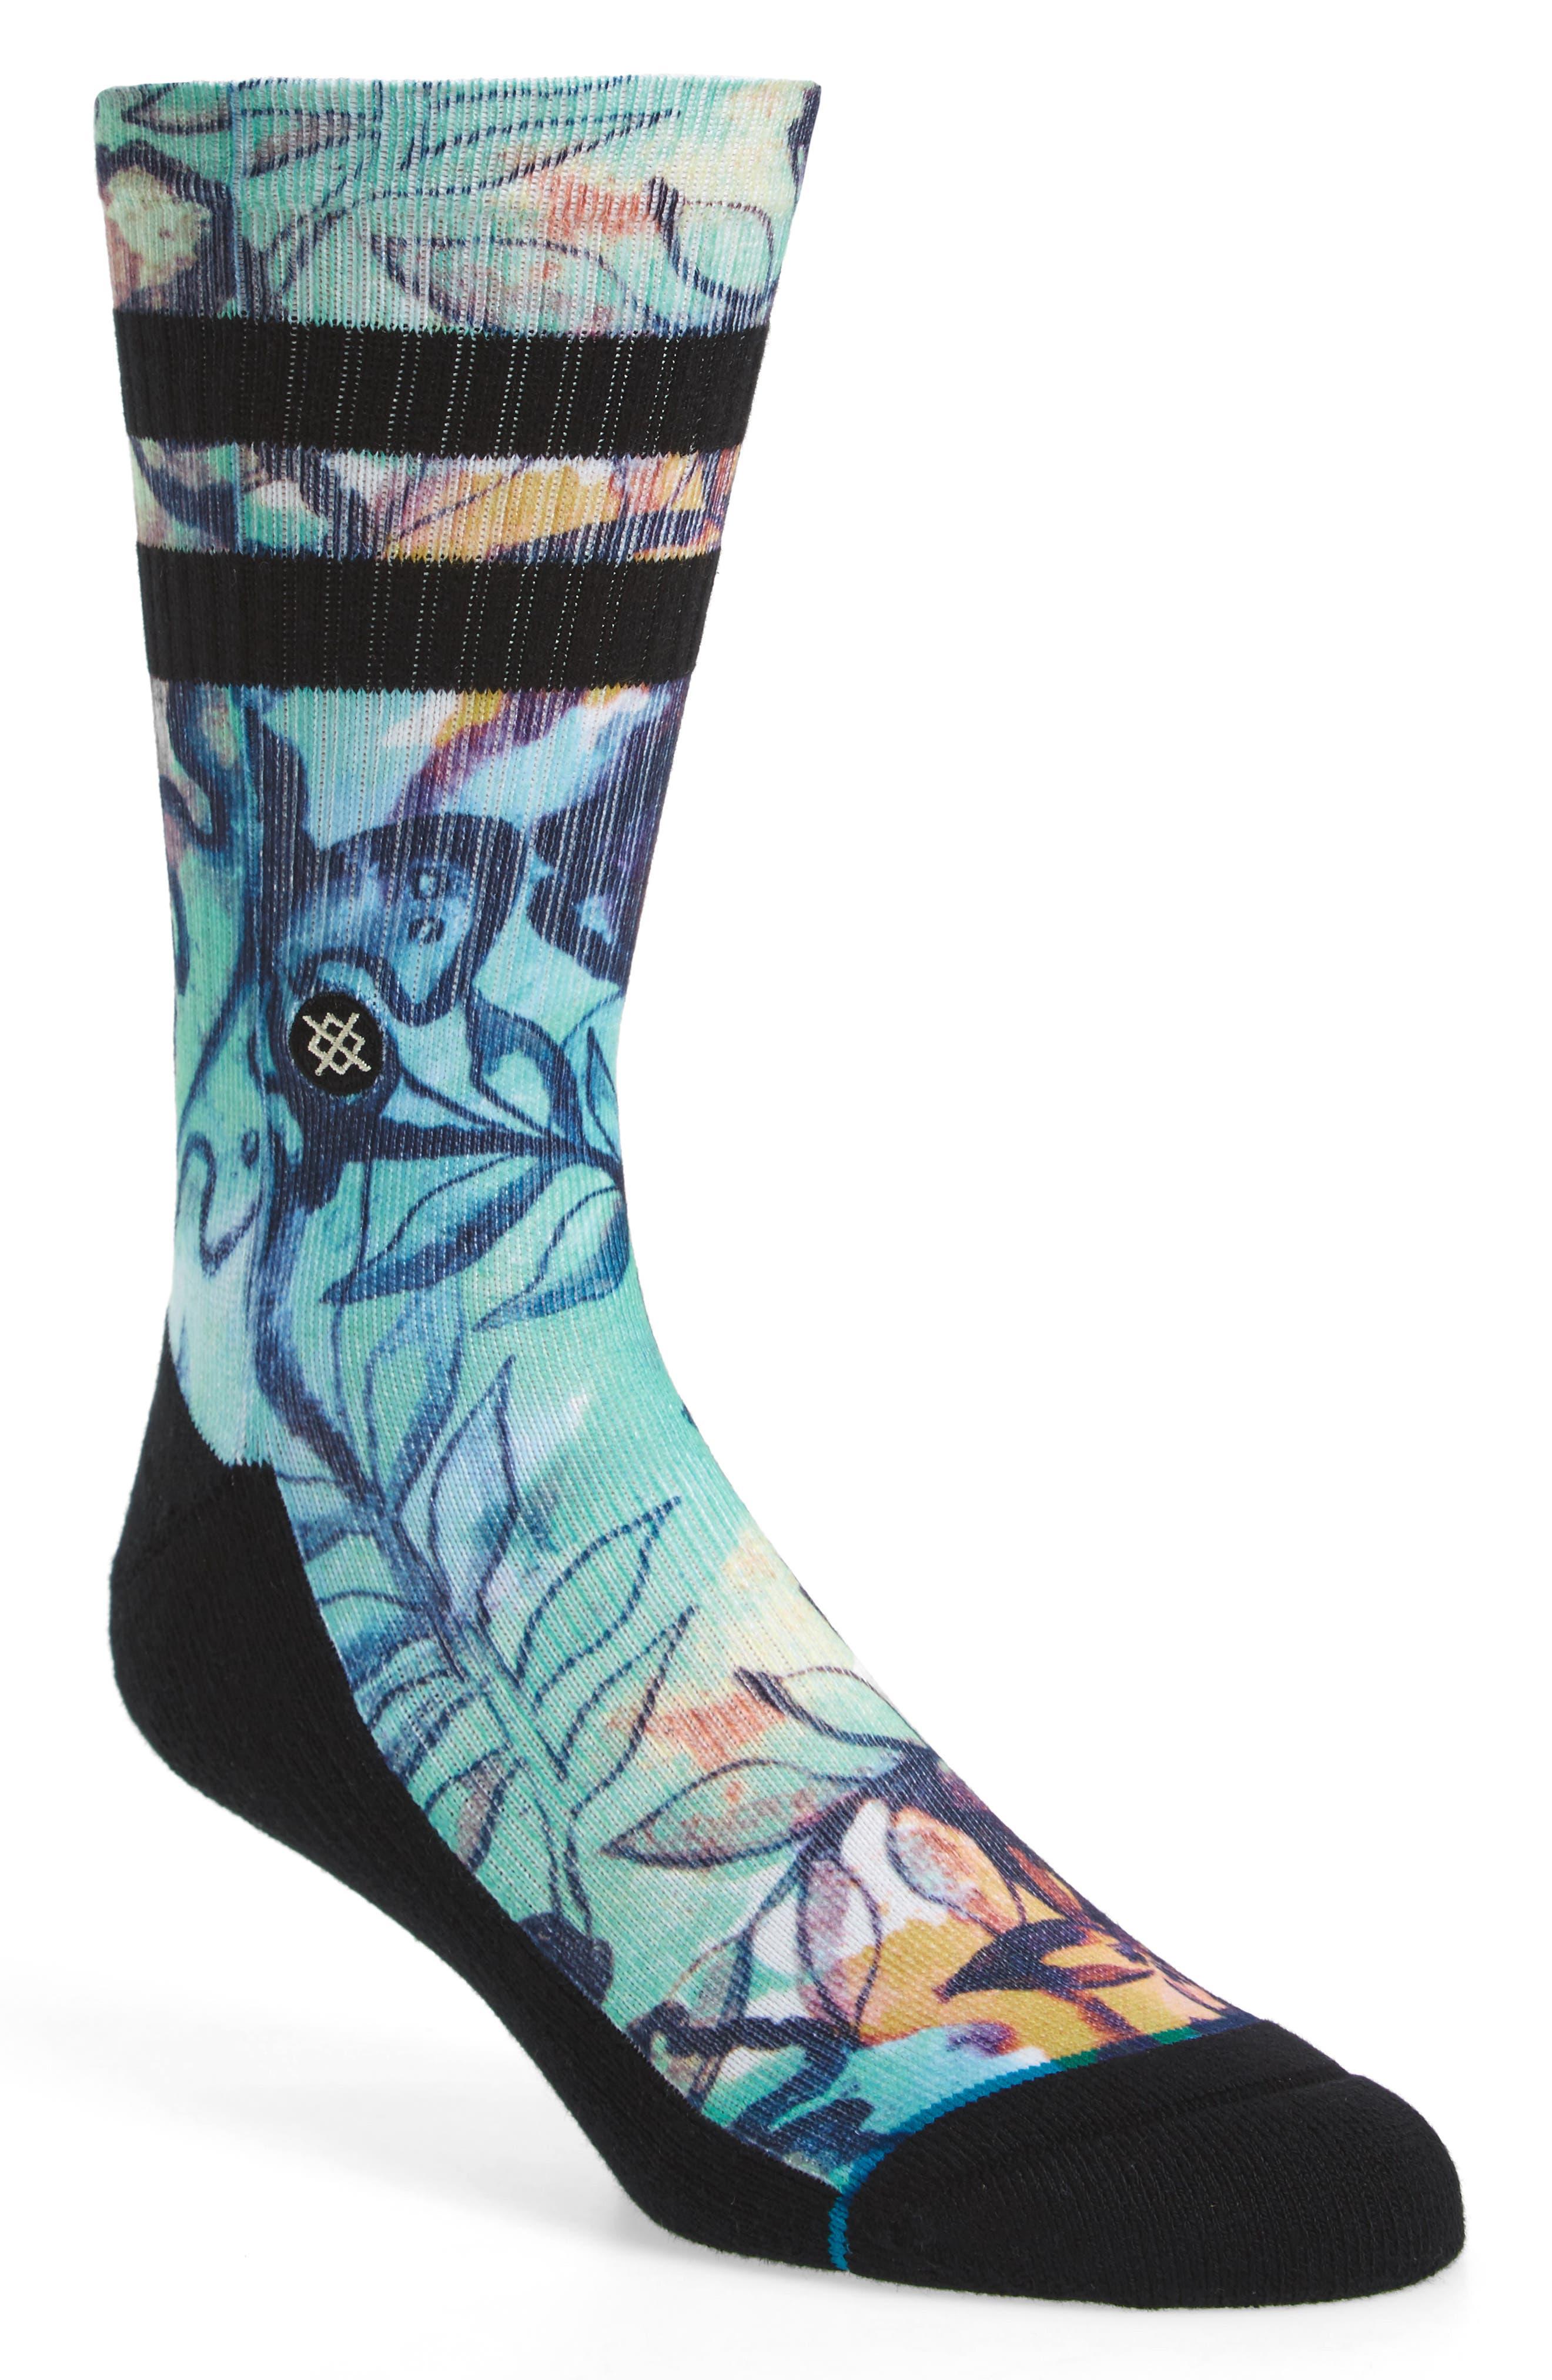 Durangoh Socks,                         Main,                         color, 400